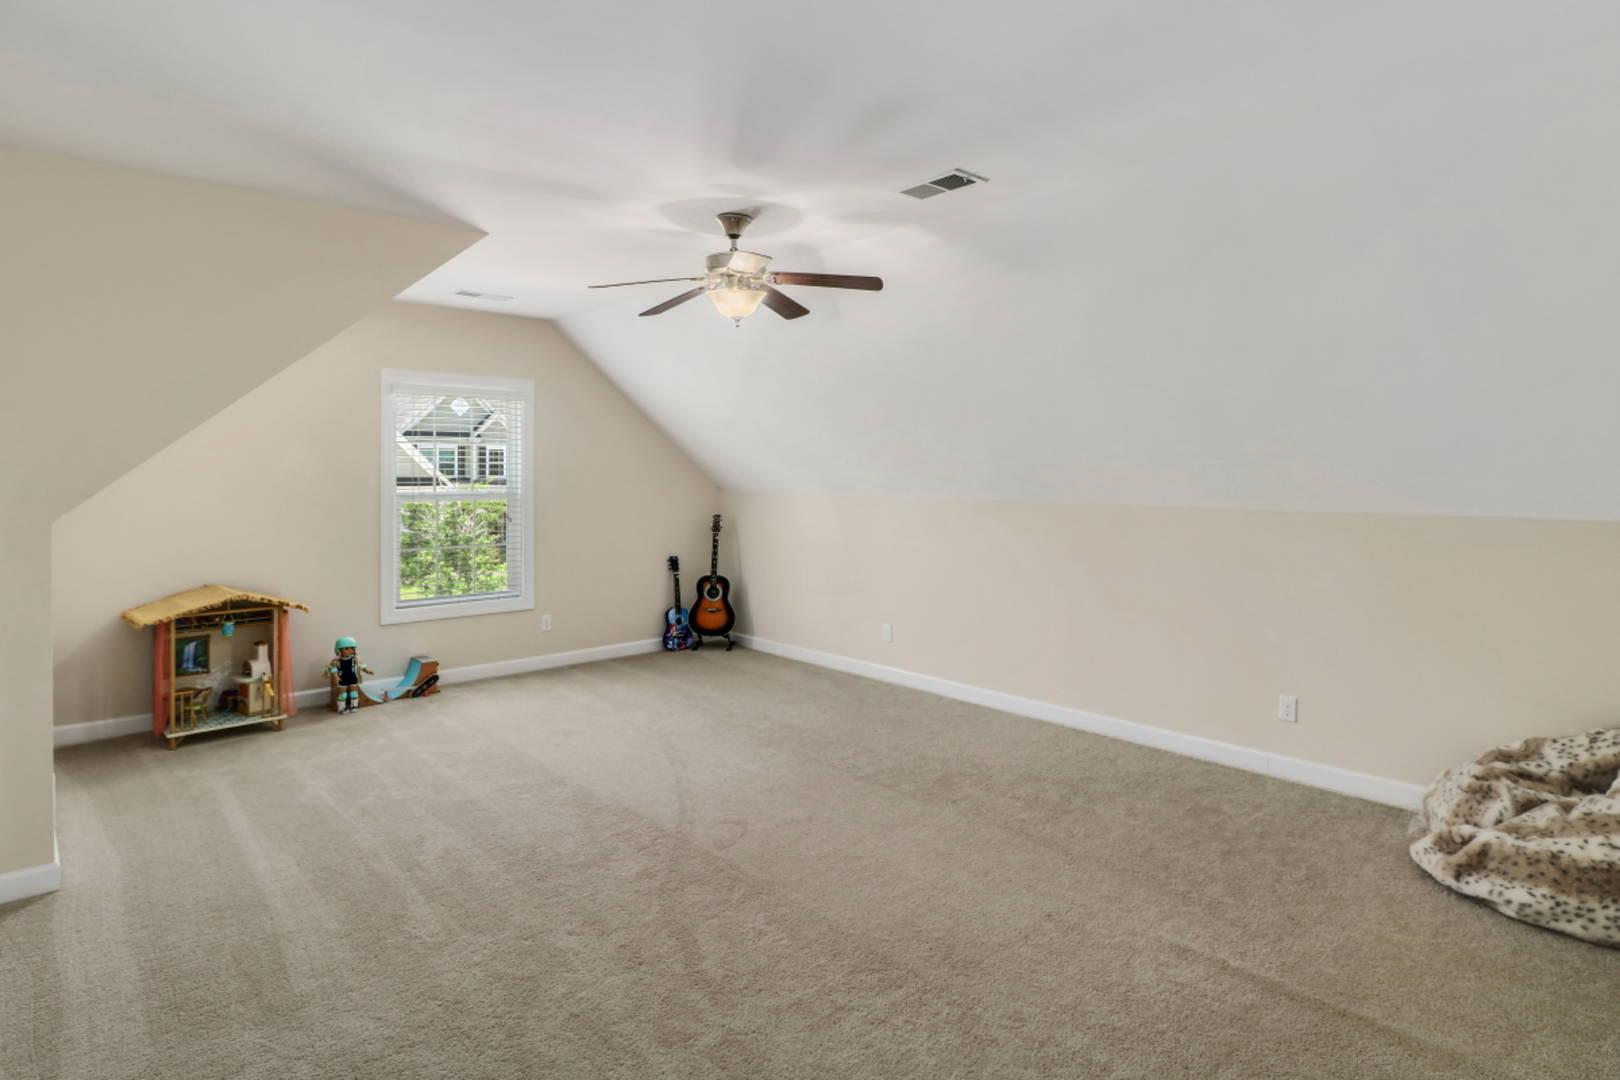 218 Claremont Way Pooler, GA 31322